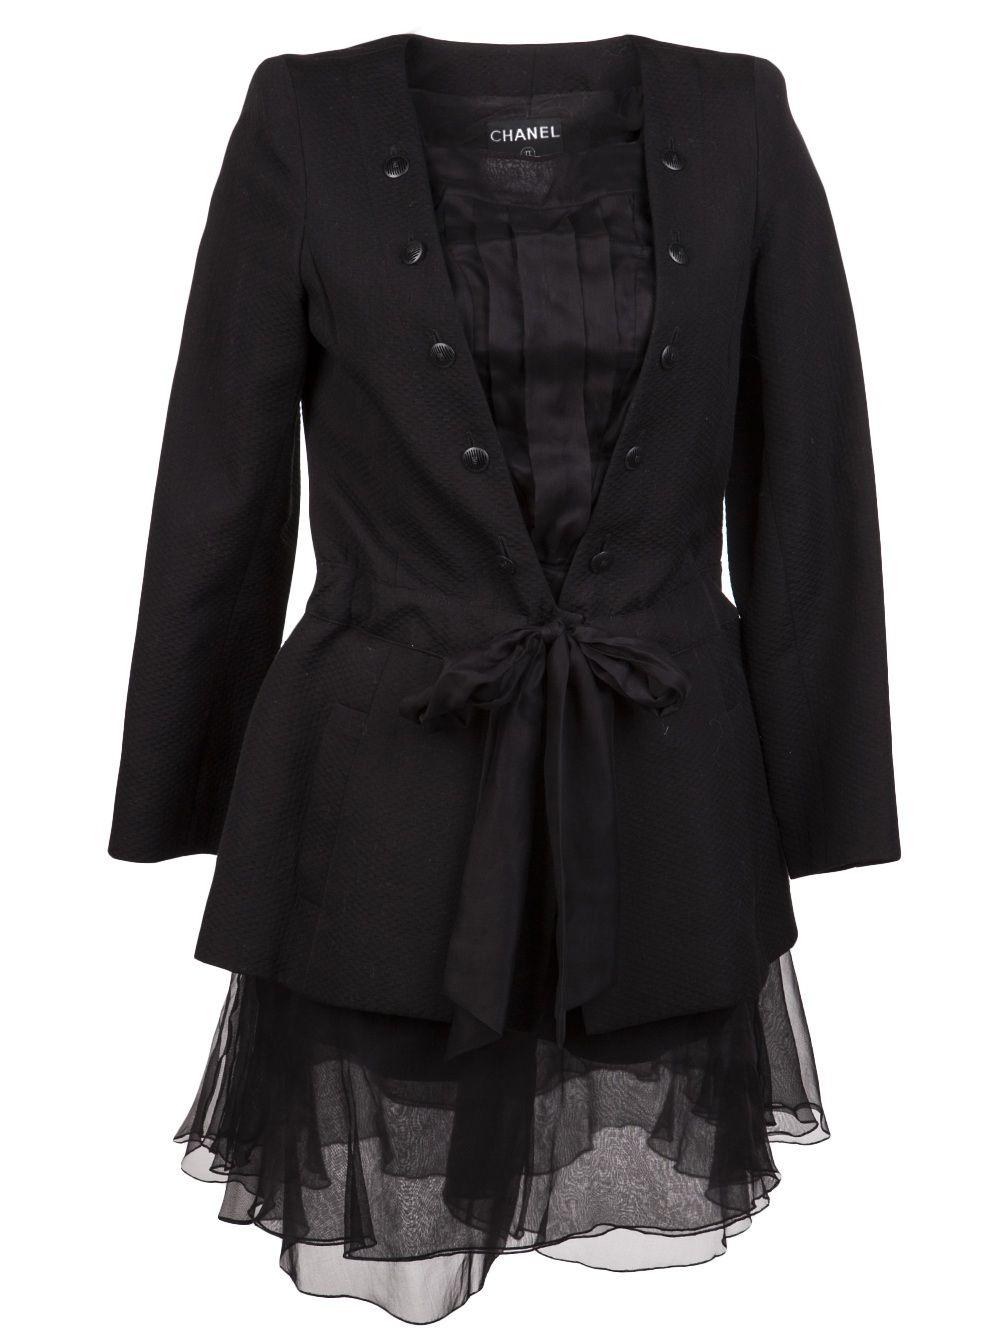 daadb50db00 Chanel Vintage Pique Suit - Amarcord Vintage Fashion - Farfetch.com ...